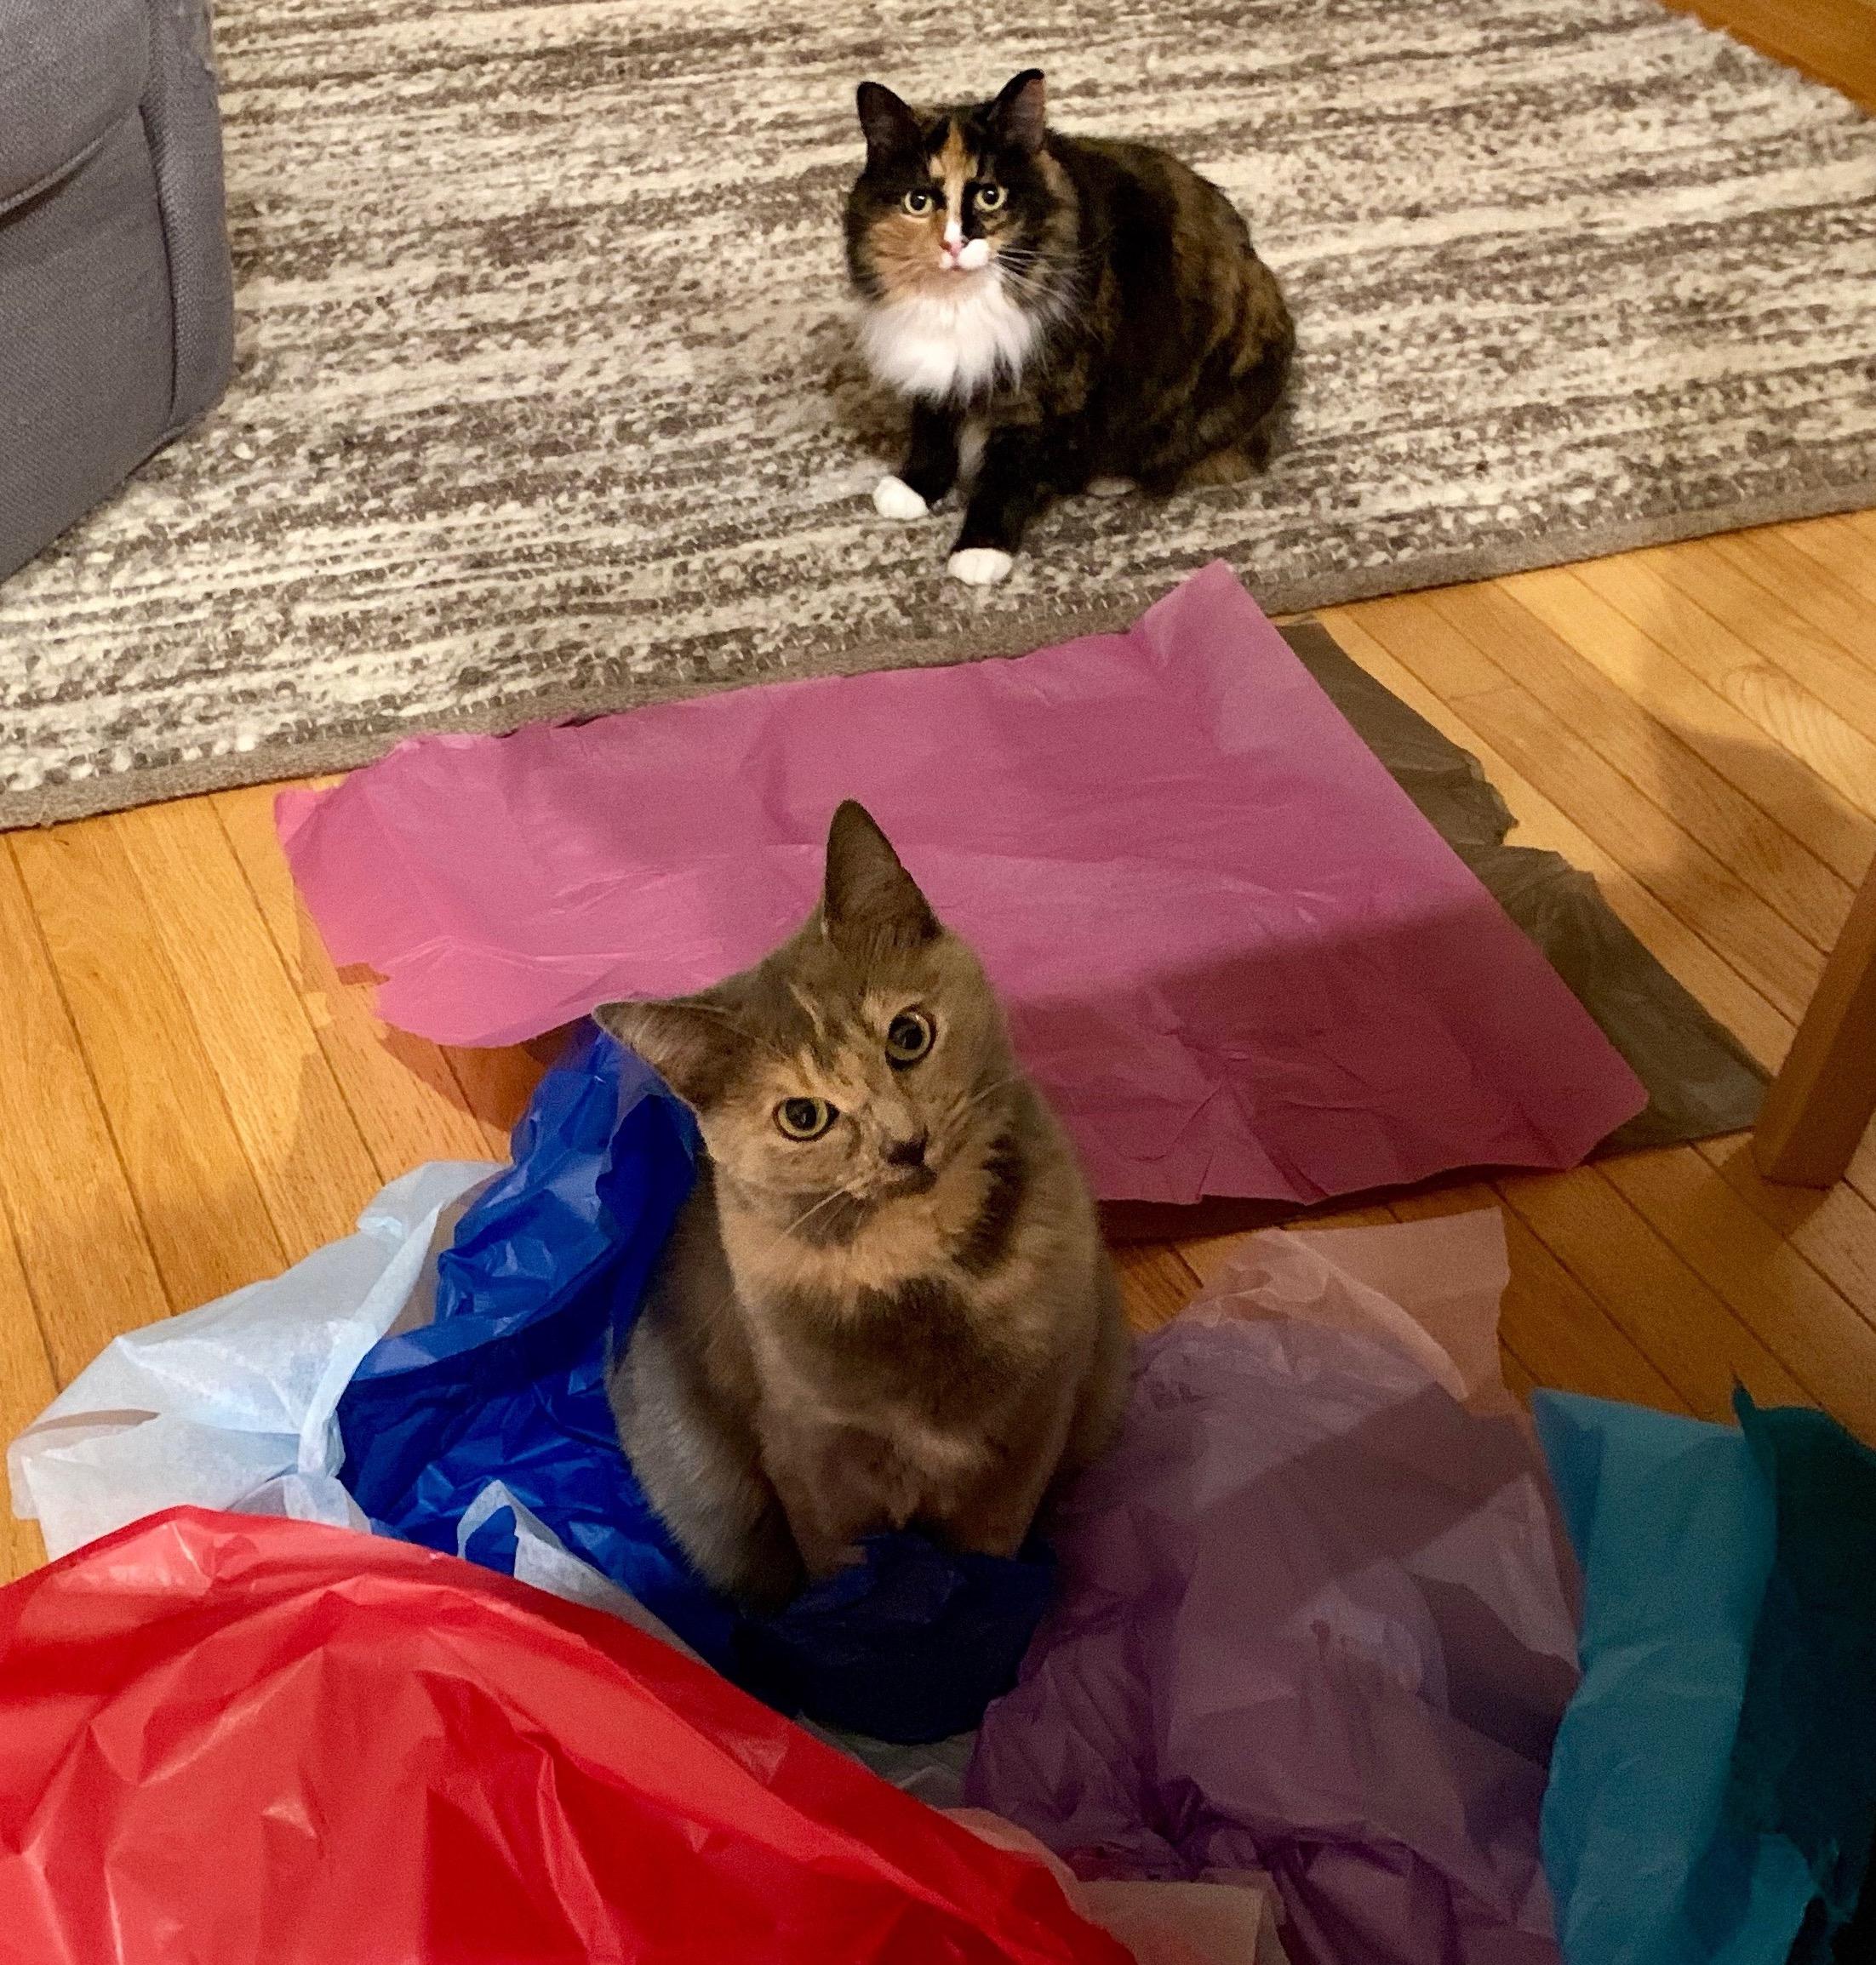 Bag Parts & Accessories Amicable Cute Cat Ear Metal Bag Handle Replacement For Diy Shoulder Bags Making Handbag